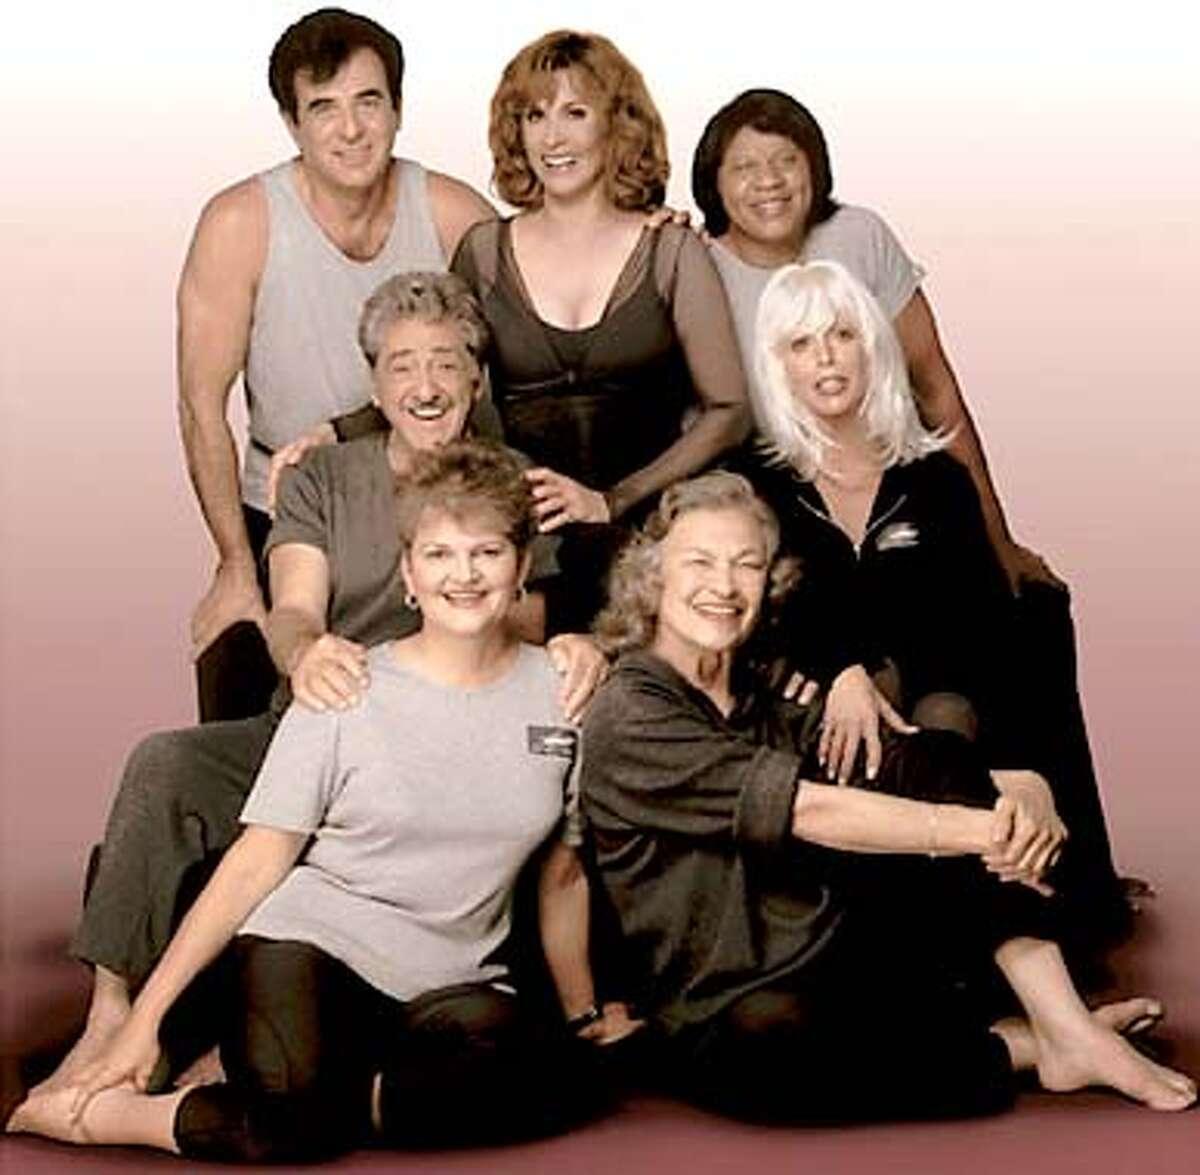 This is the cast of the Silver Foxes pilates tape. from left back row: Tony Tarantino, Stephanie Powers, Christine Johnson; middle row: Sal Pacino, Nikki Robbins; bottom row: Jenny Crawford, Patsy Swayze. HANDOUT